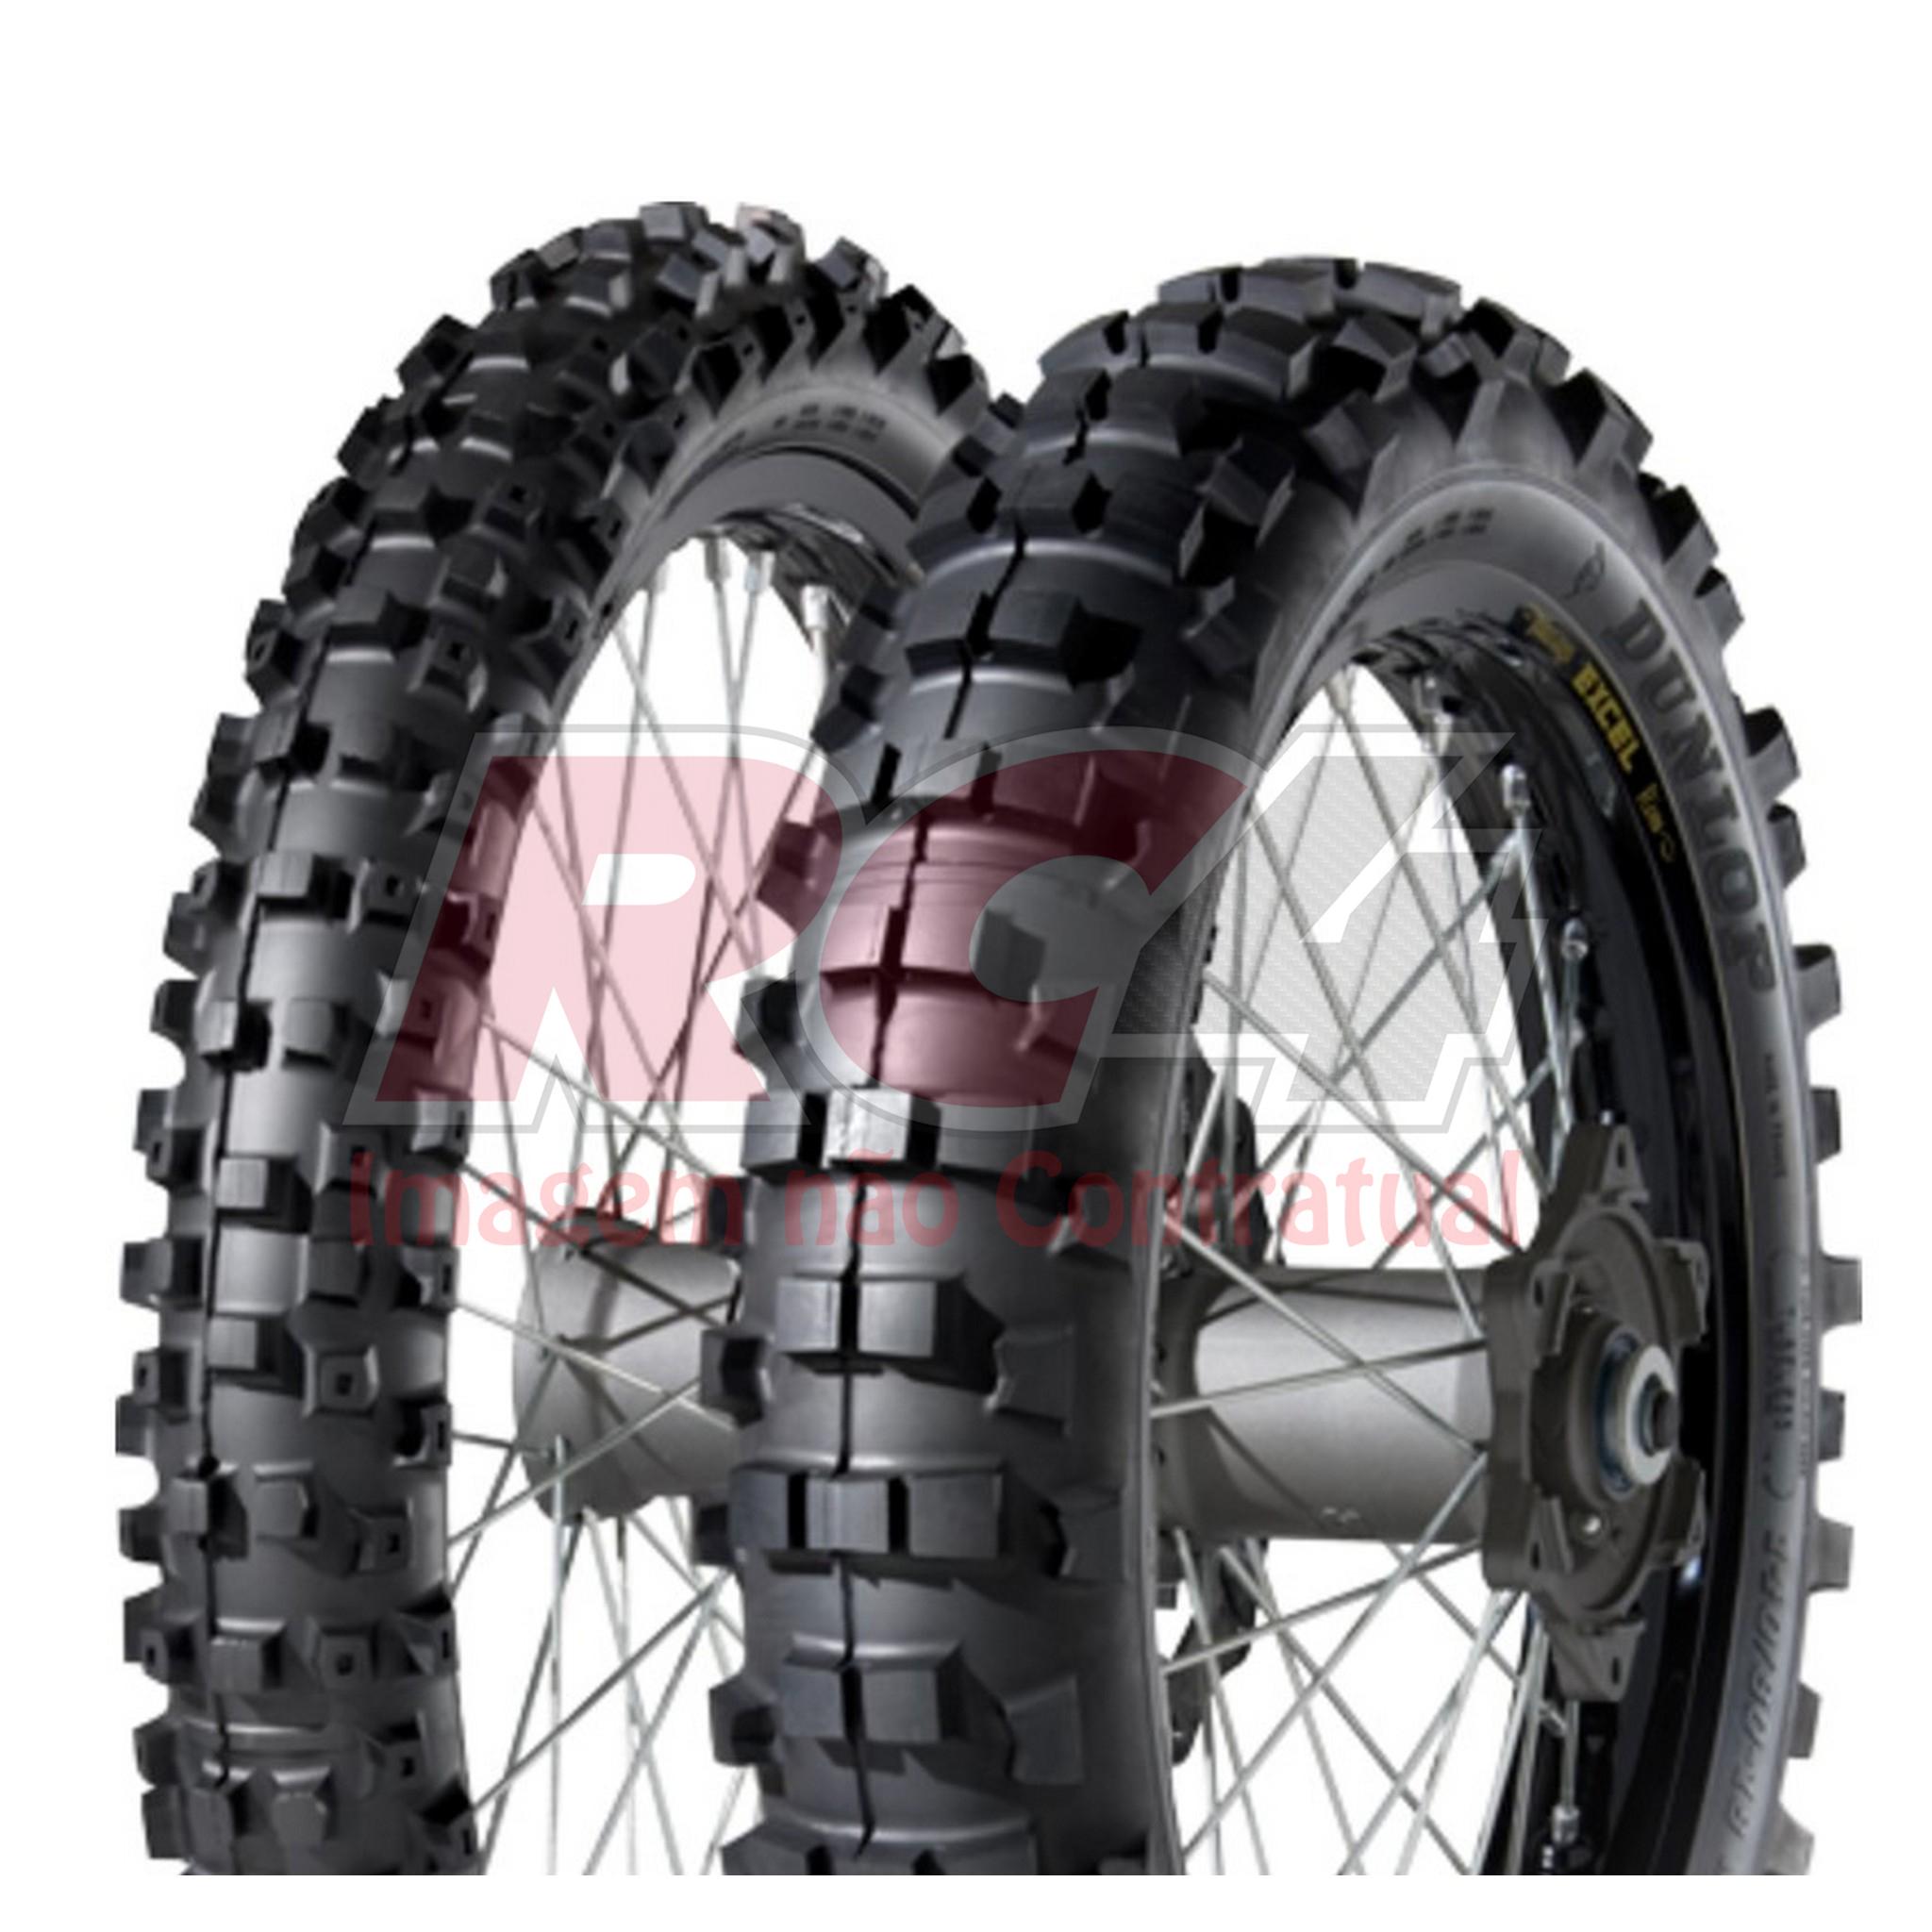 Pneu Dunlop Geomax Enduro 90/90-21 54R S